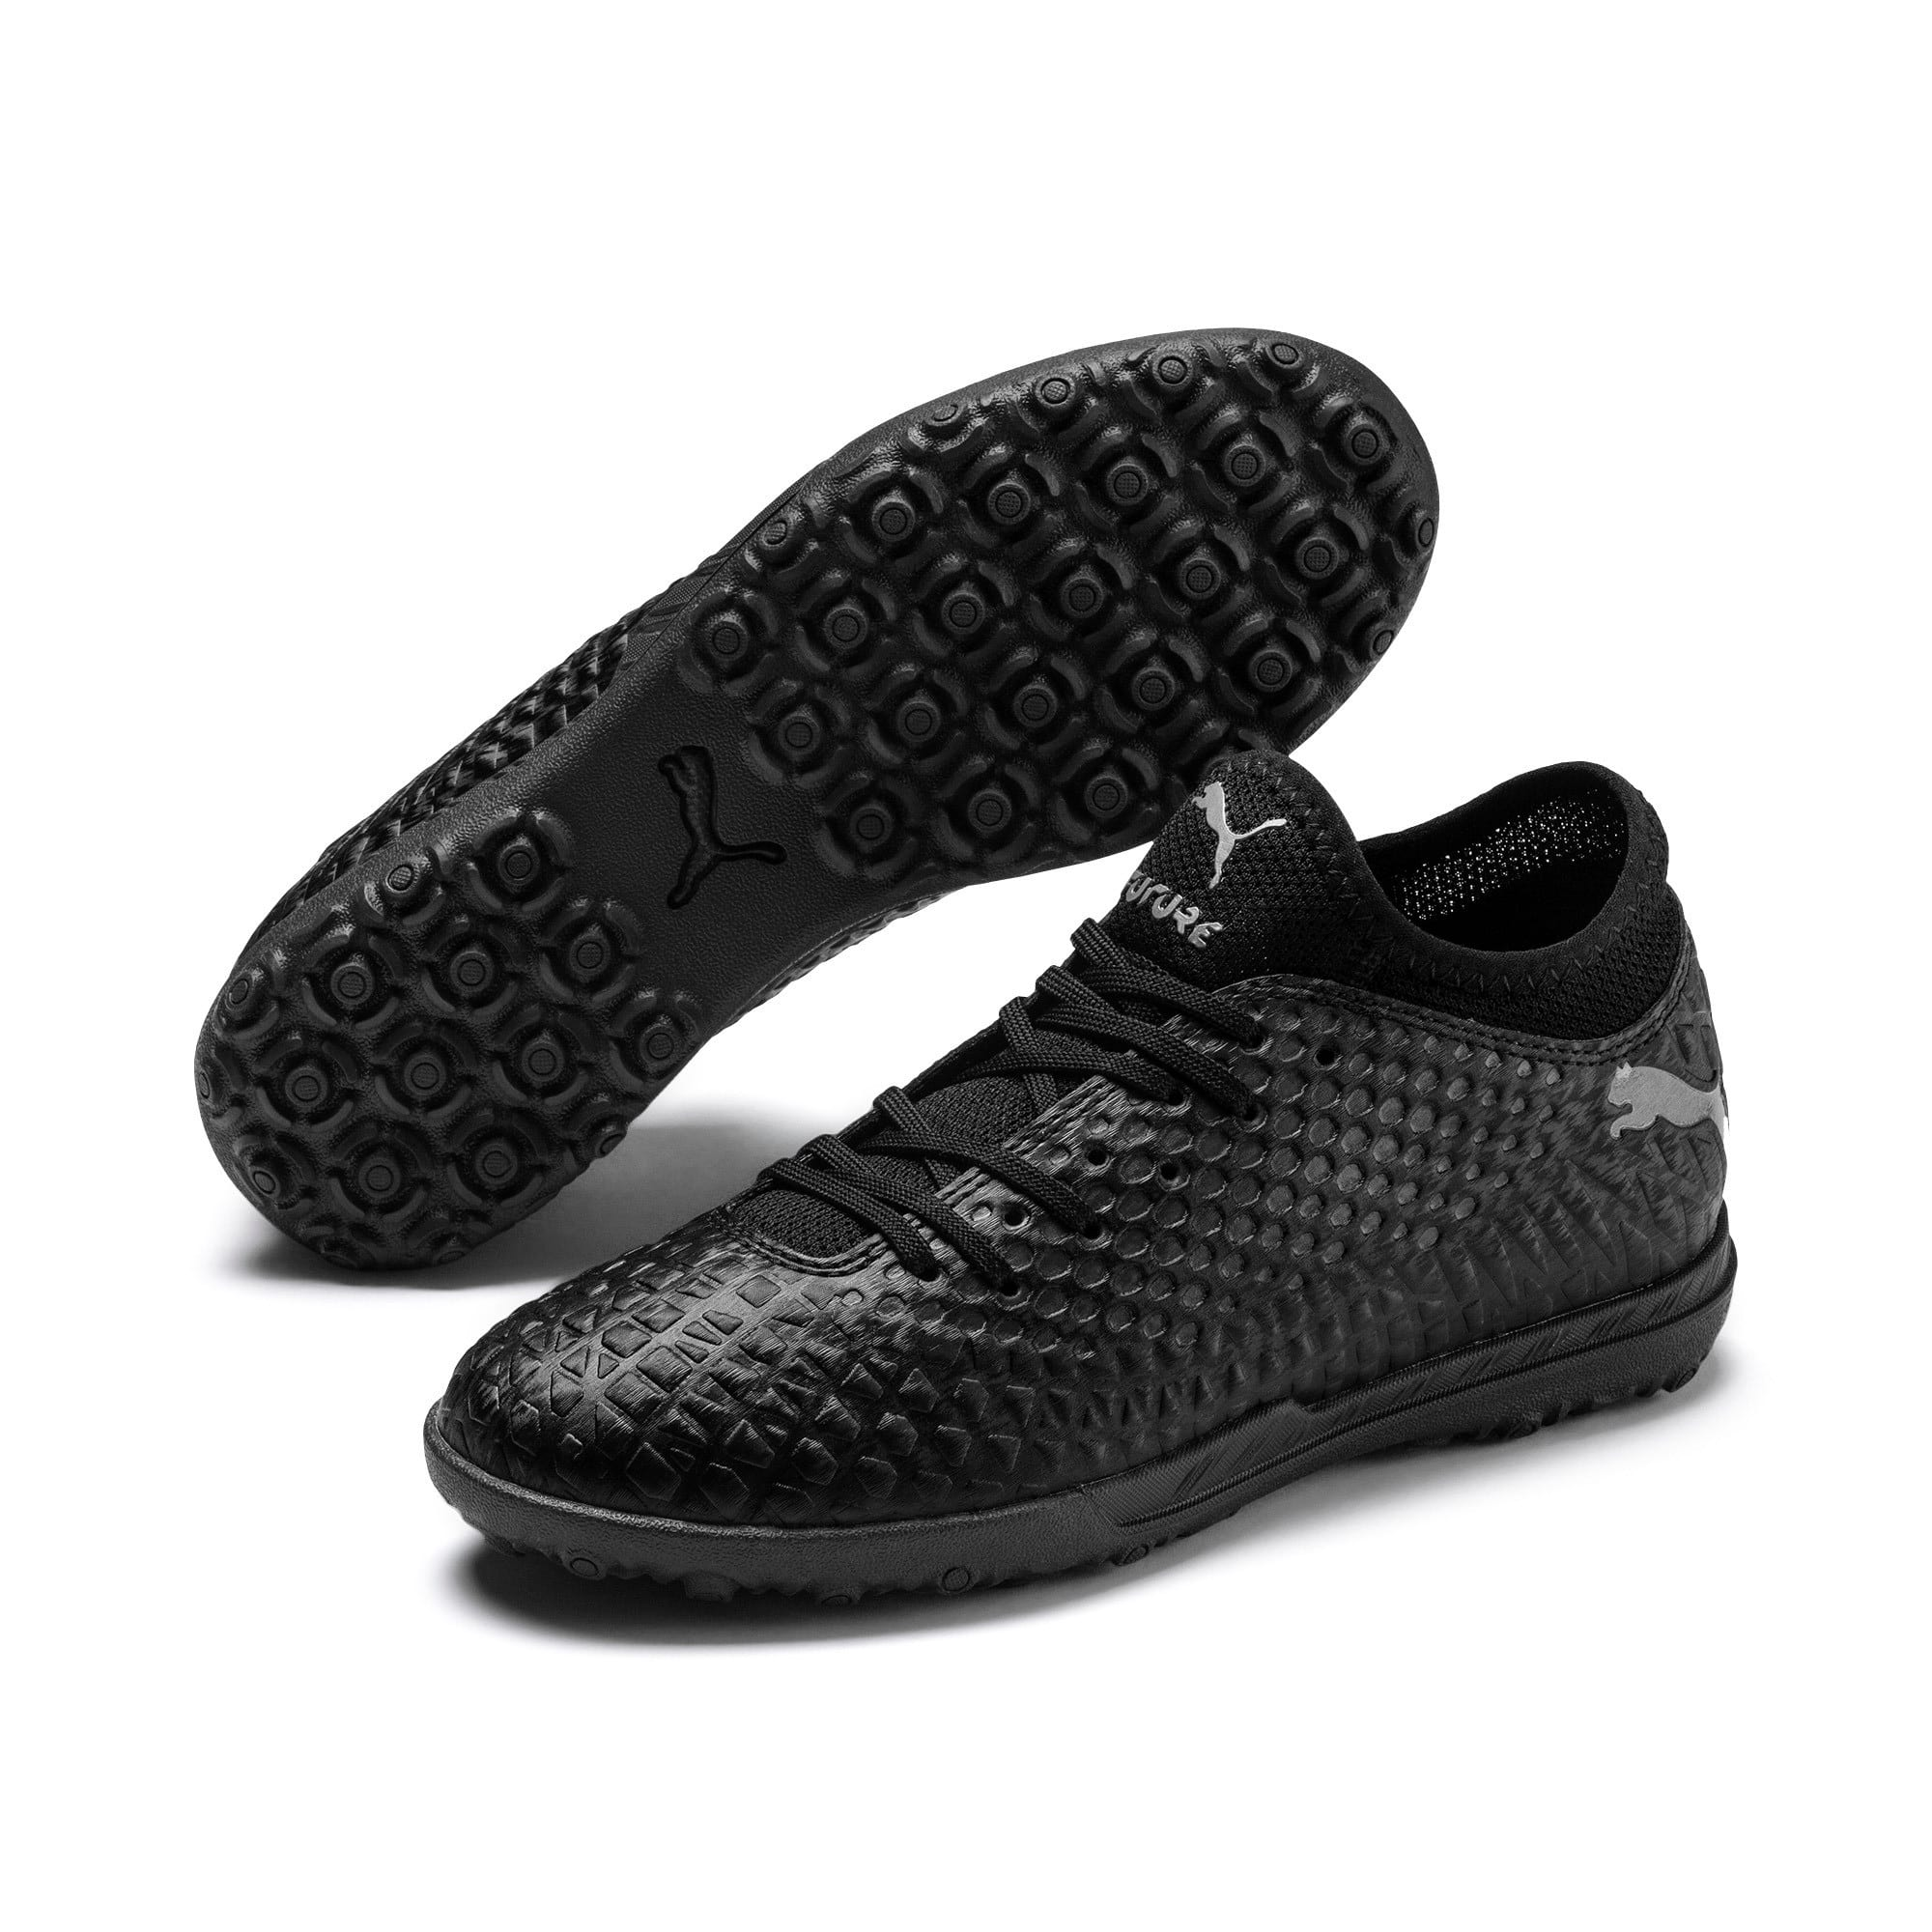 Imagen en miniatura 2 de Botas de fútbol de juvenil FUTURE 4.4 TT, Black-Black-Puma Aged Silver, mediana